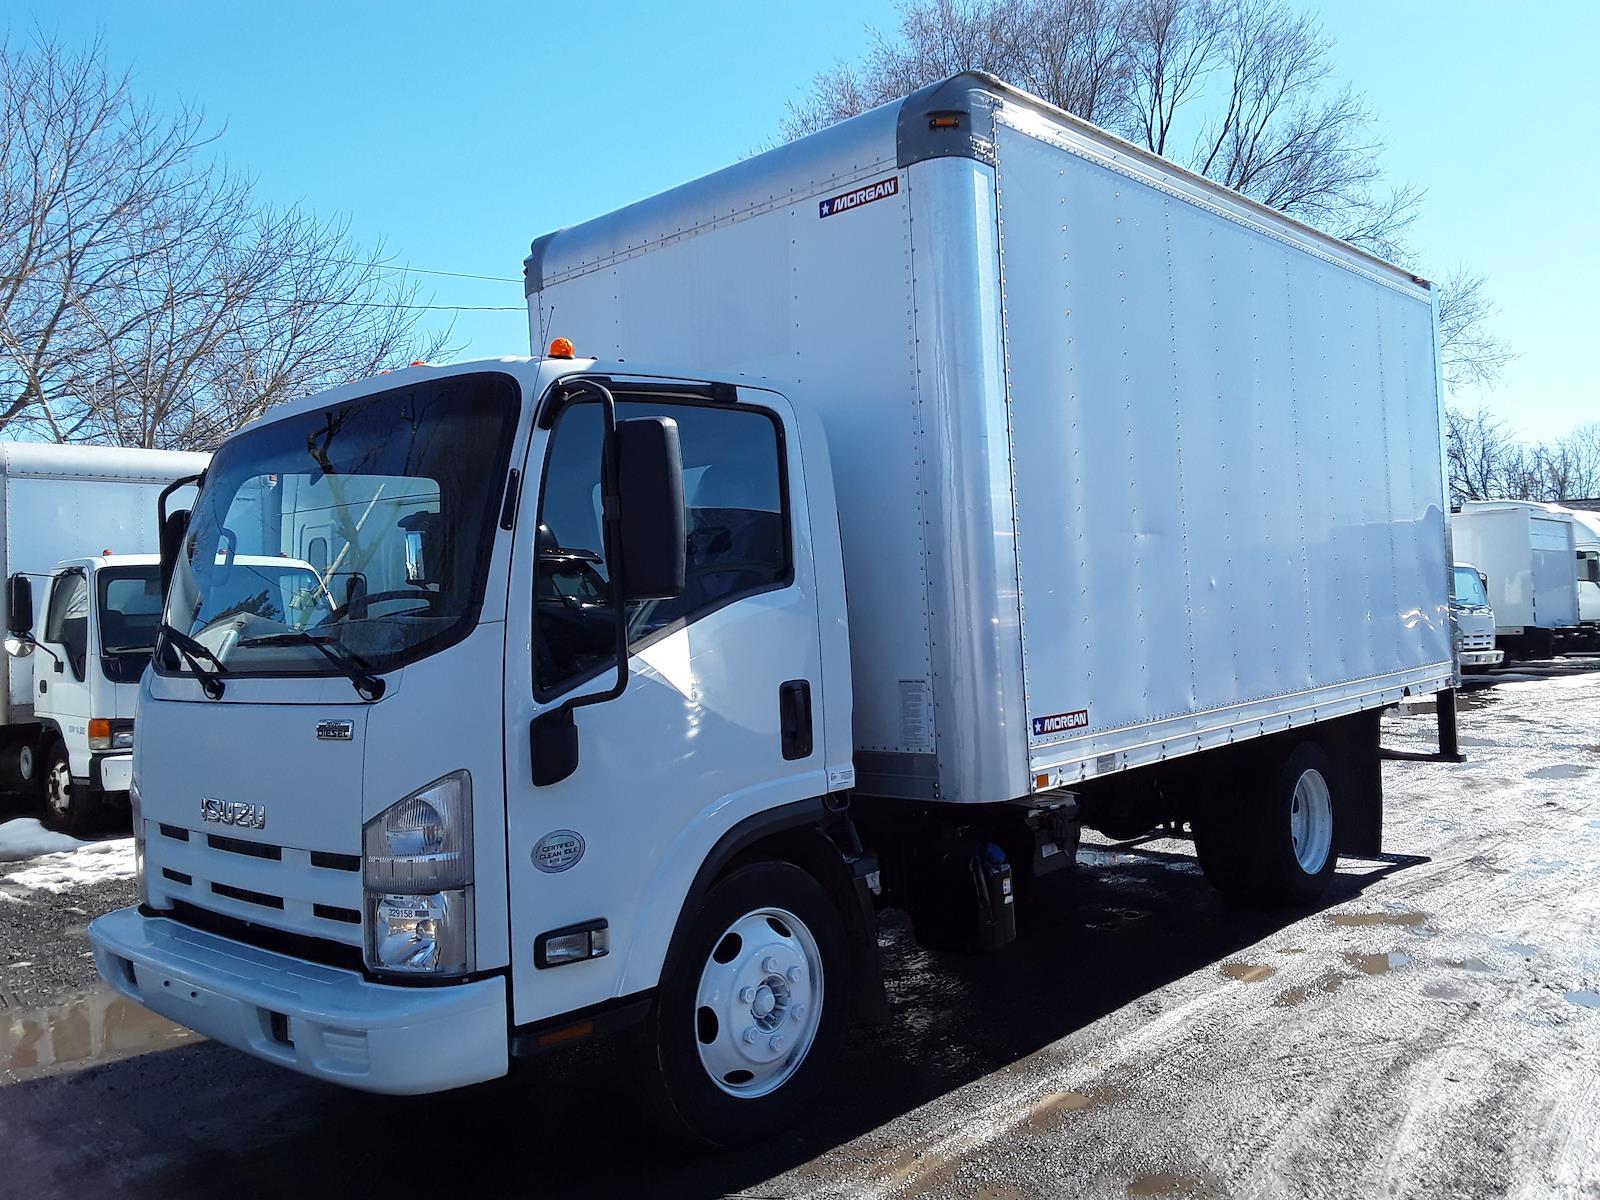 2015 Isuzu NQR Regular Cab 4x2, Dry Freight #329158 - photo 1